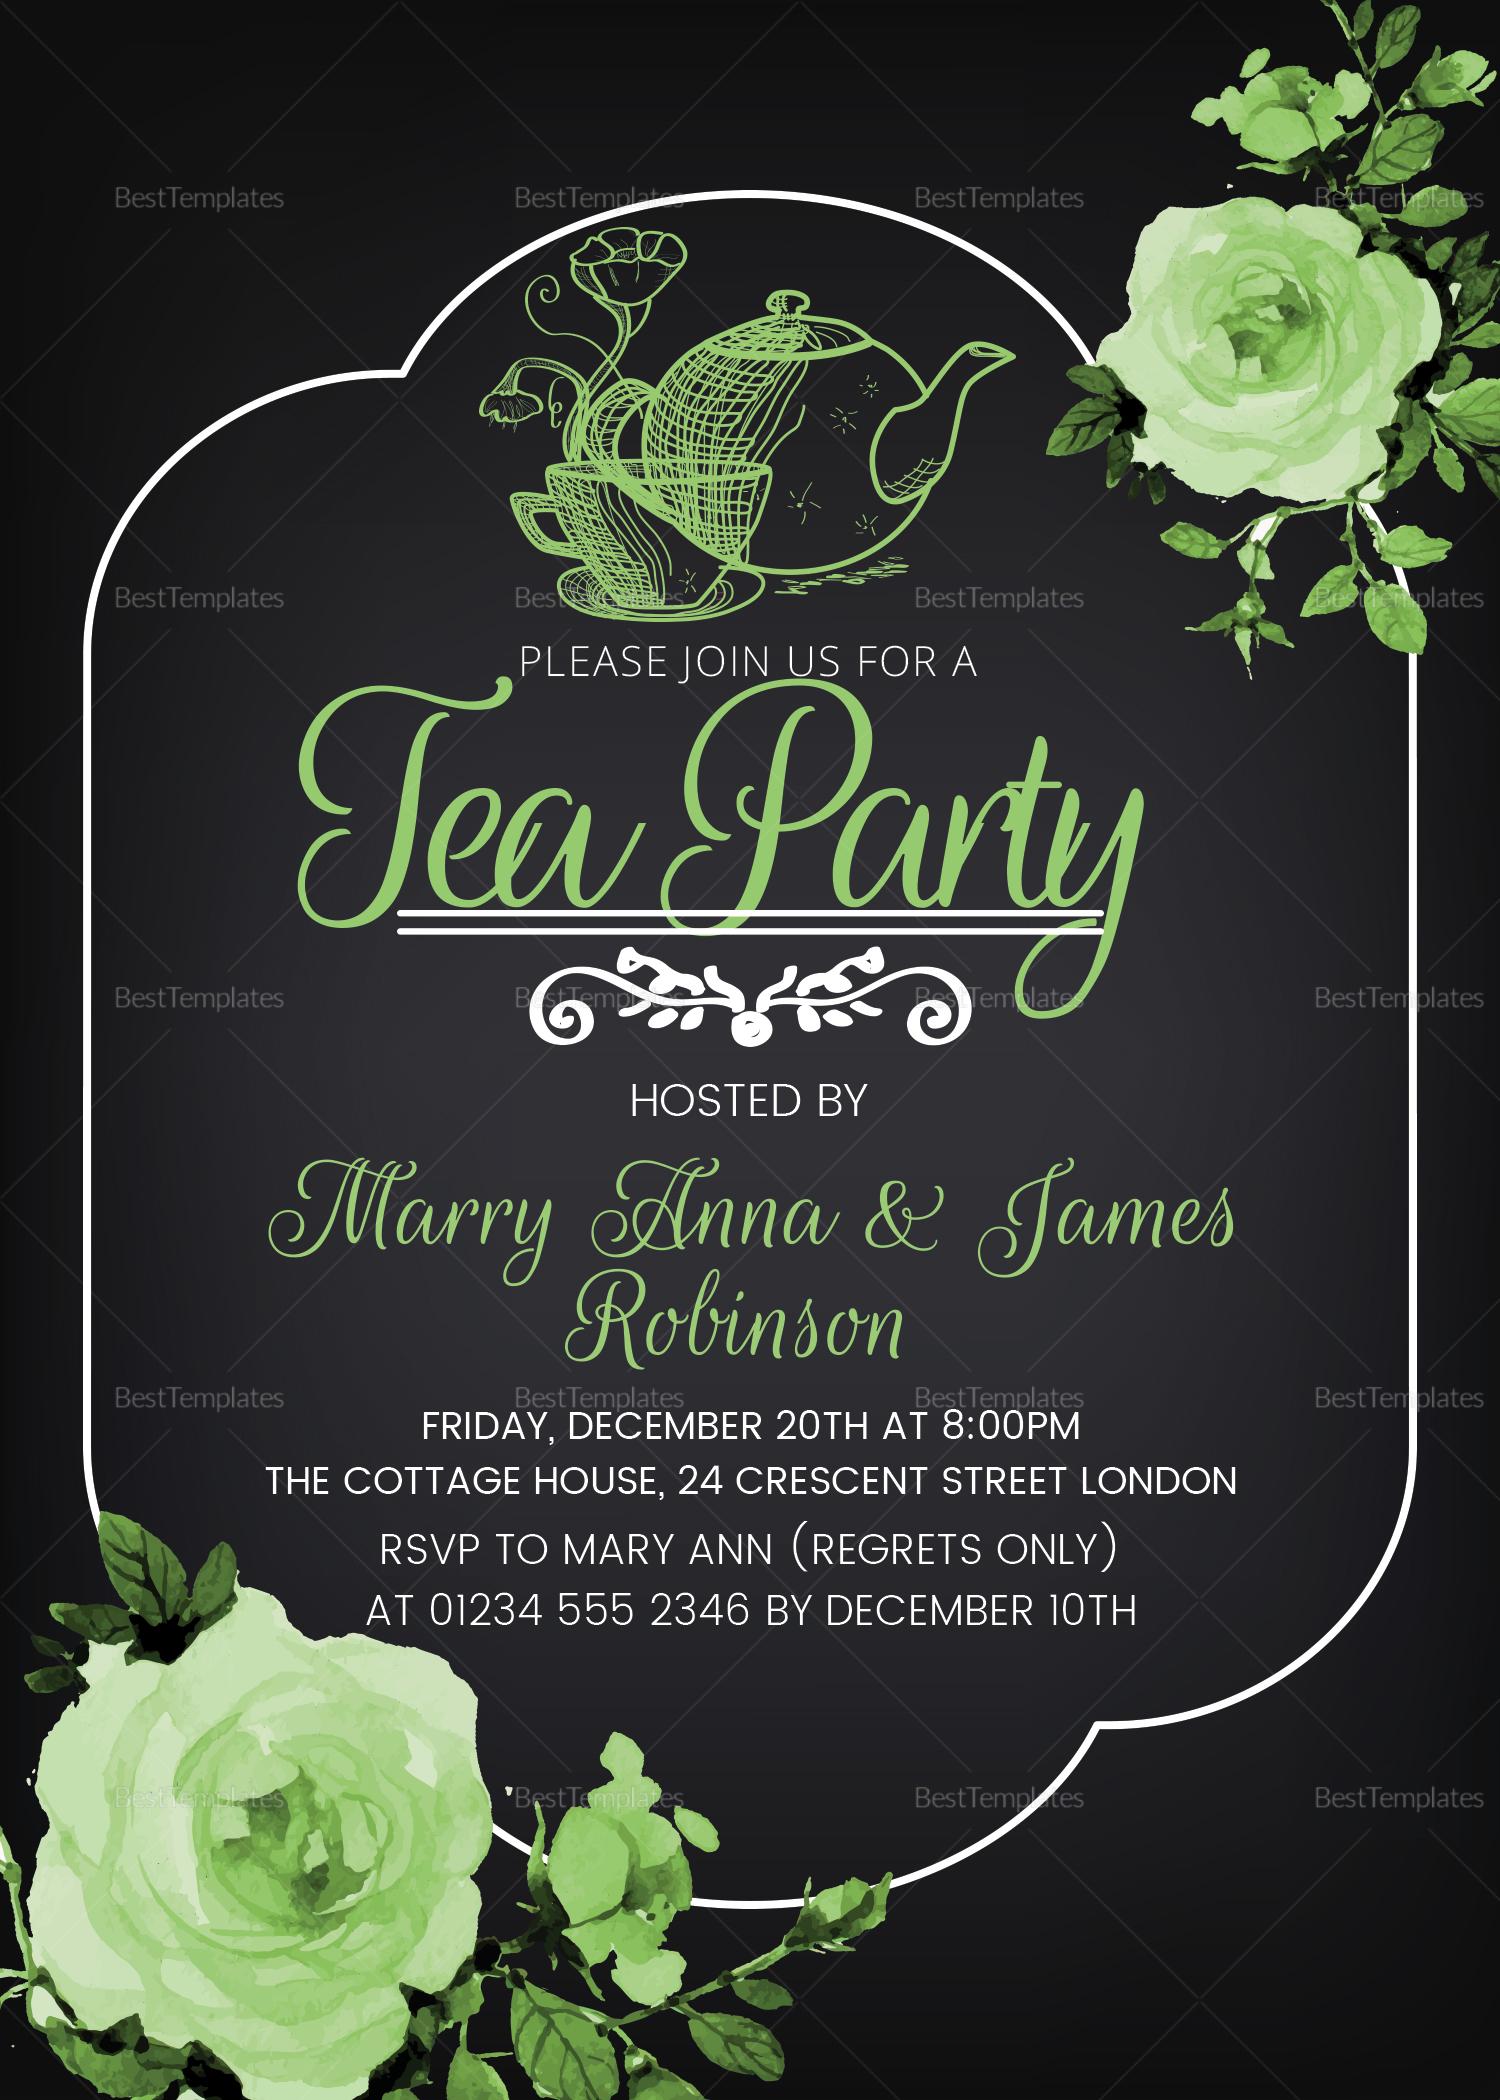 Tea Party Invitation Card Design Template